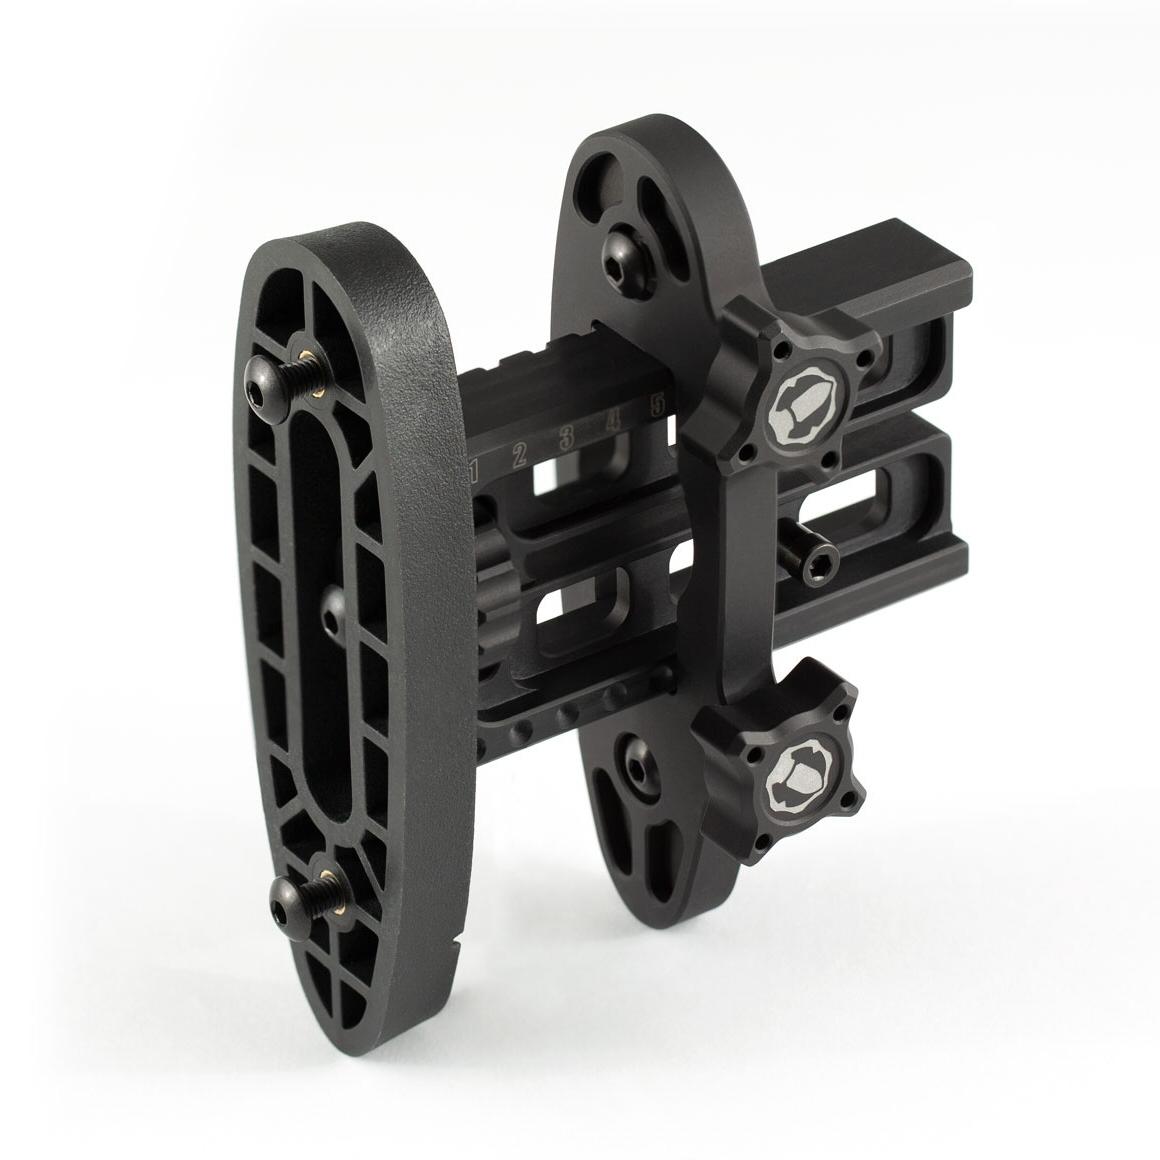 KRG Bravo Tool-Less LOP (Length of Pull) Kit